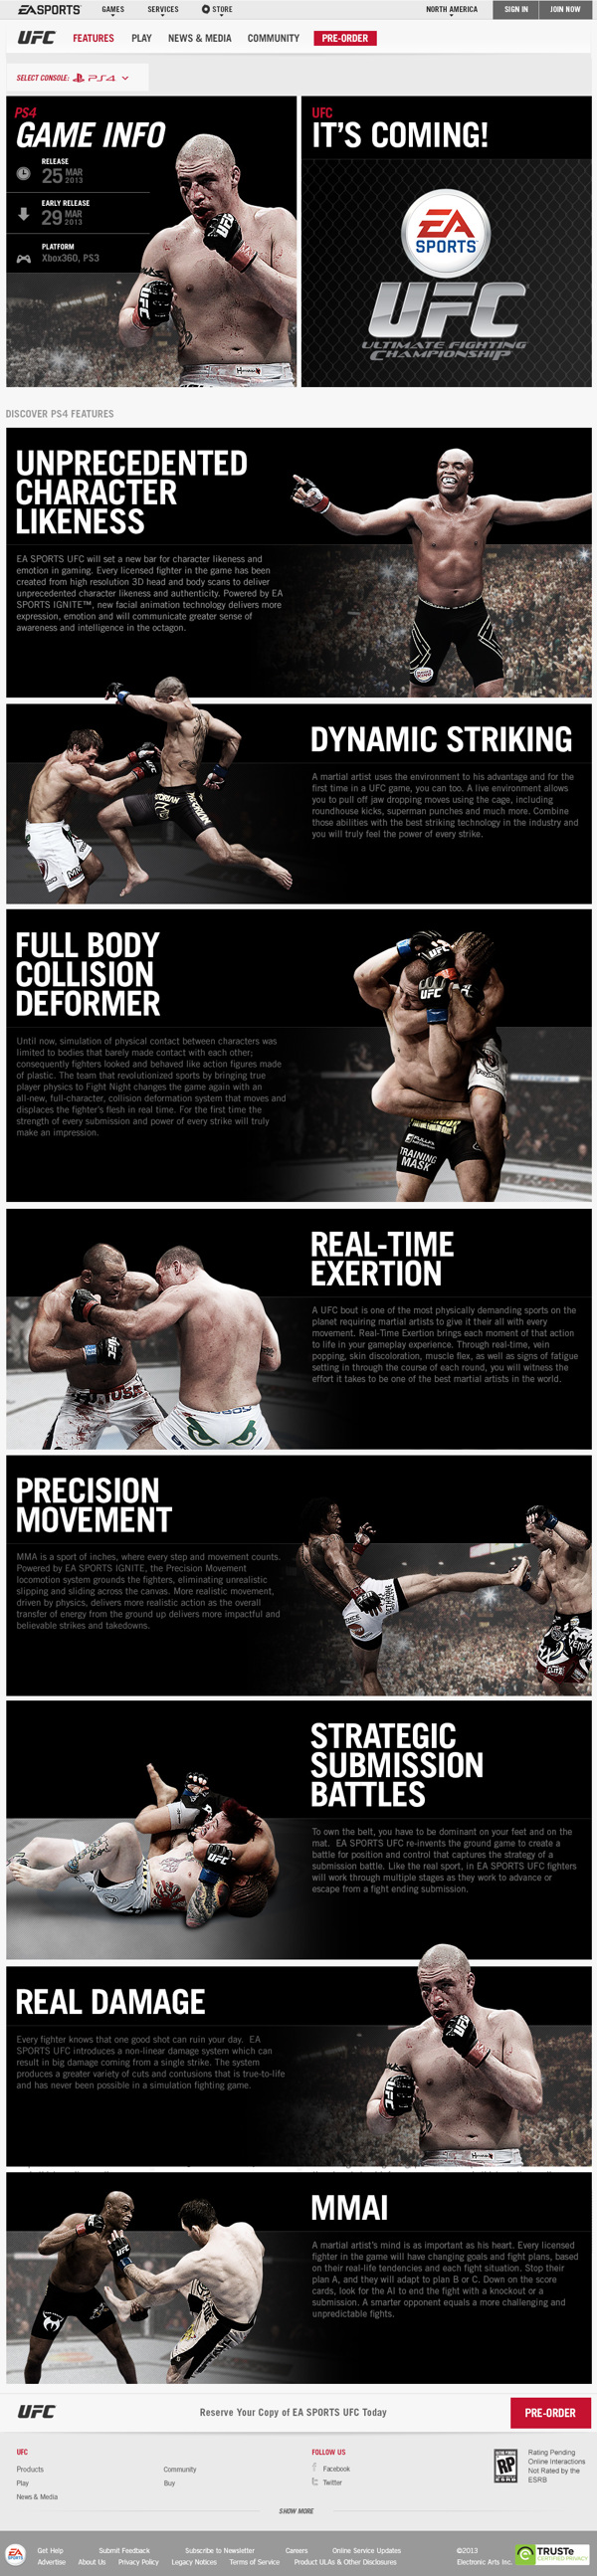 EA SPORTS UFC on Behance Ea sports ufc, Ea sports, Ufc